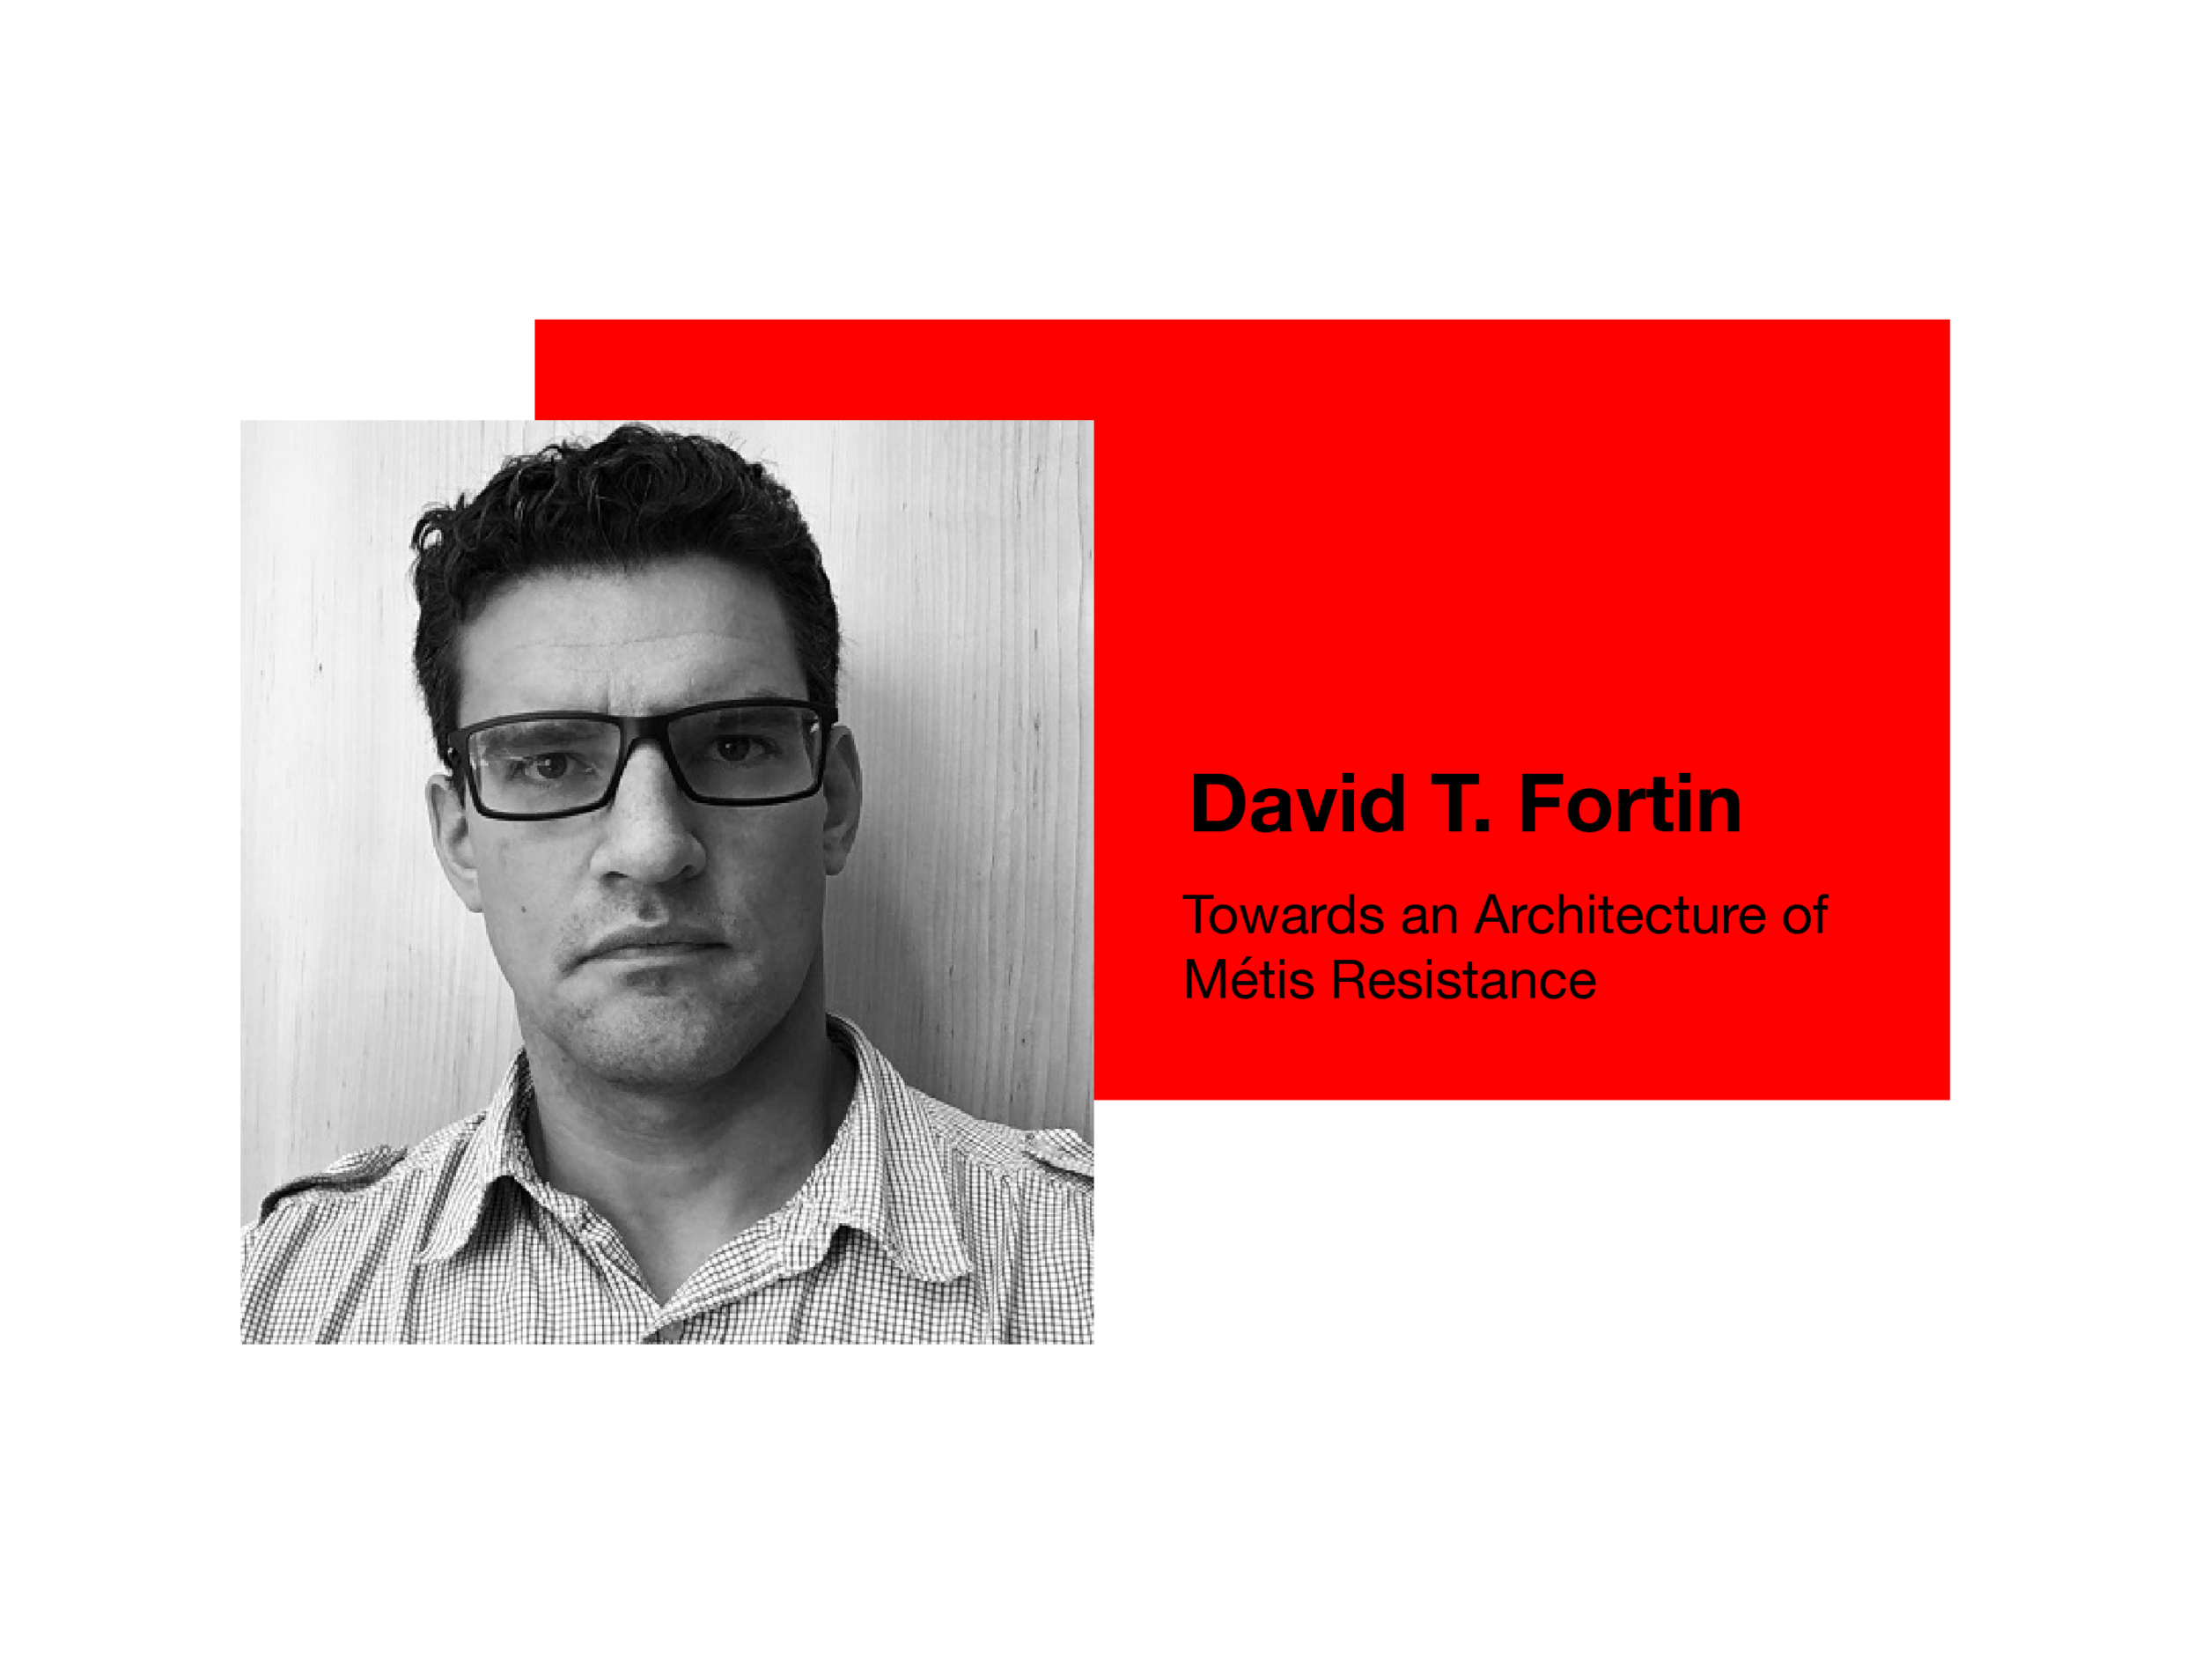 David T. Fortin